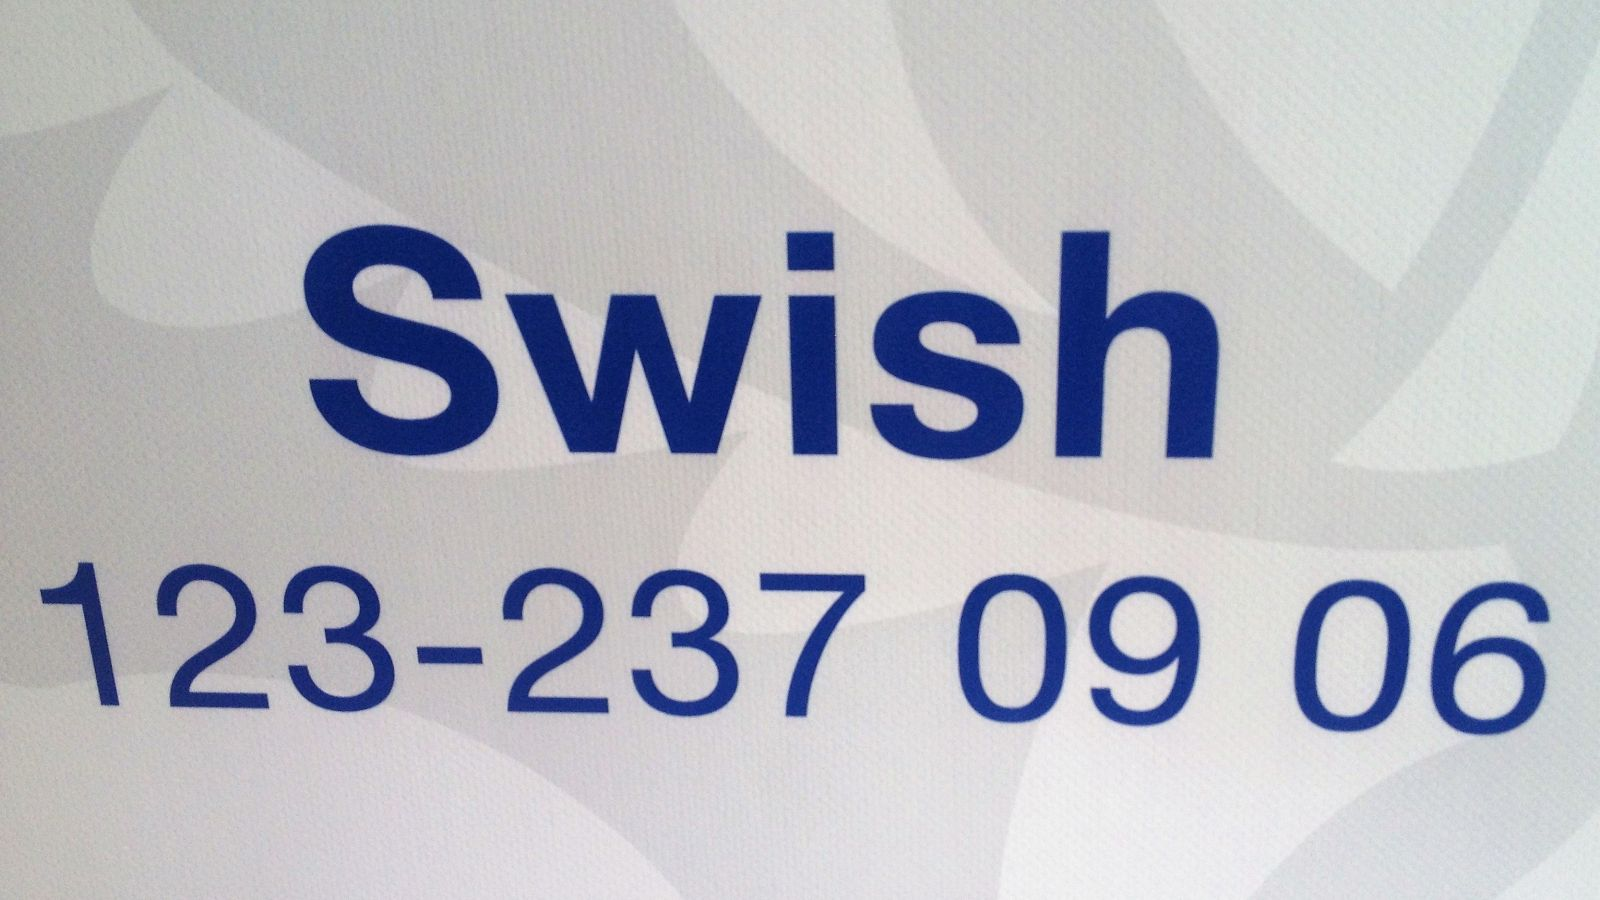 Lions Club Gnesta har Swish-nummer 123-237 09 06